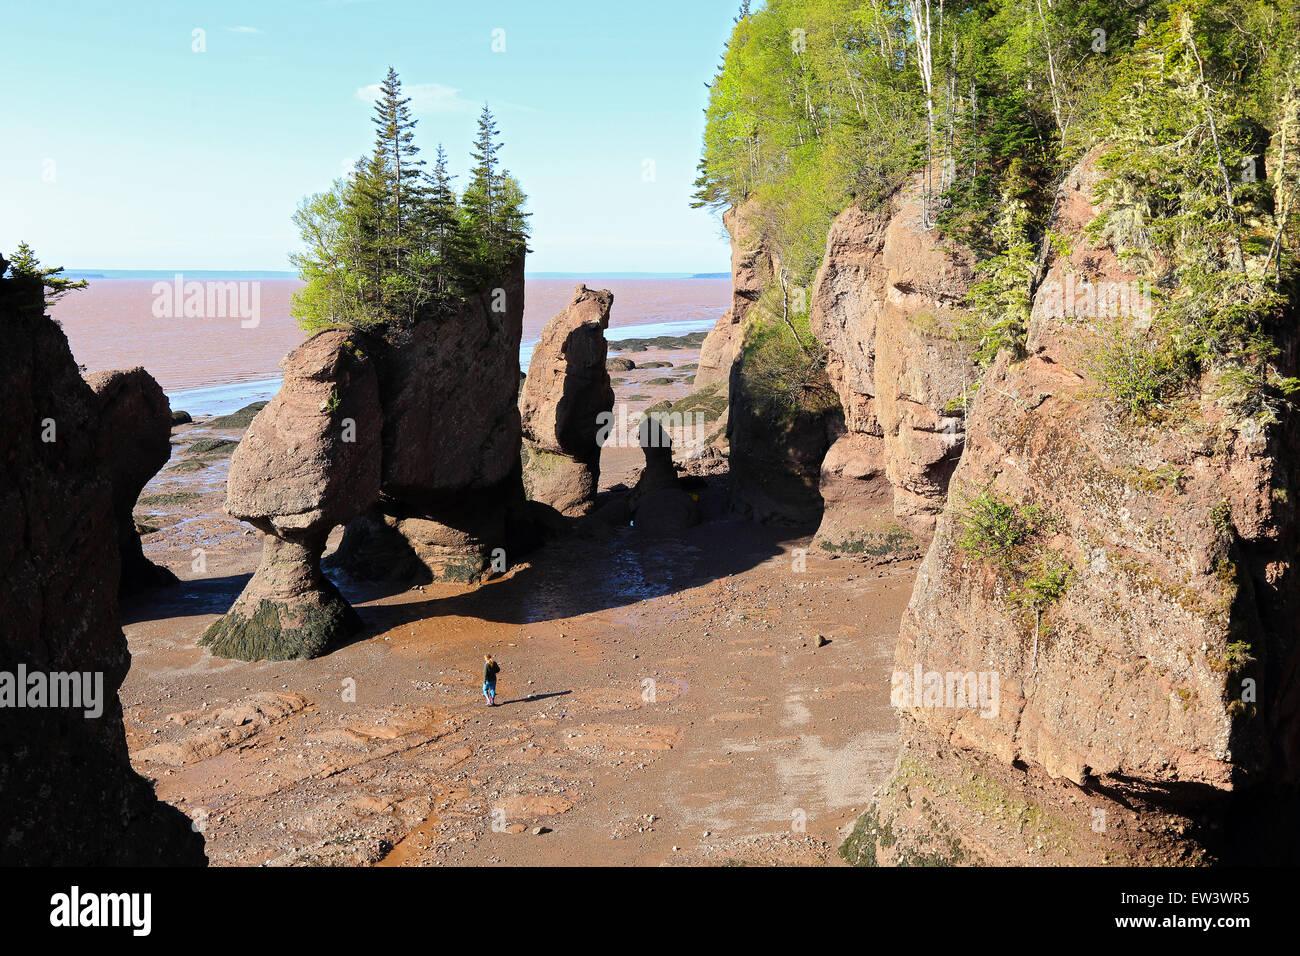 Bay Of Fundy, New Brunswick, Kanada Hopewell Rocks Strand bei Ebbe mit Touristen Strand zu Fuß. Stockbild